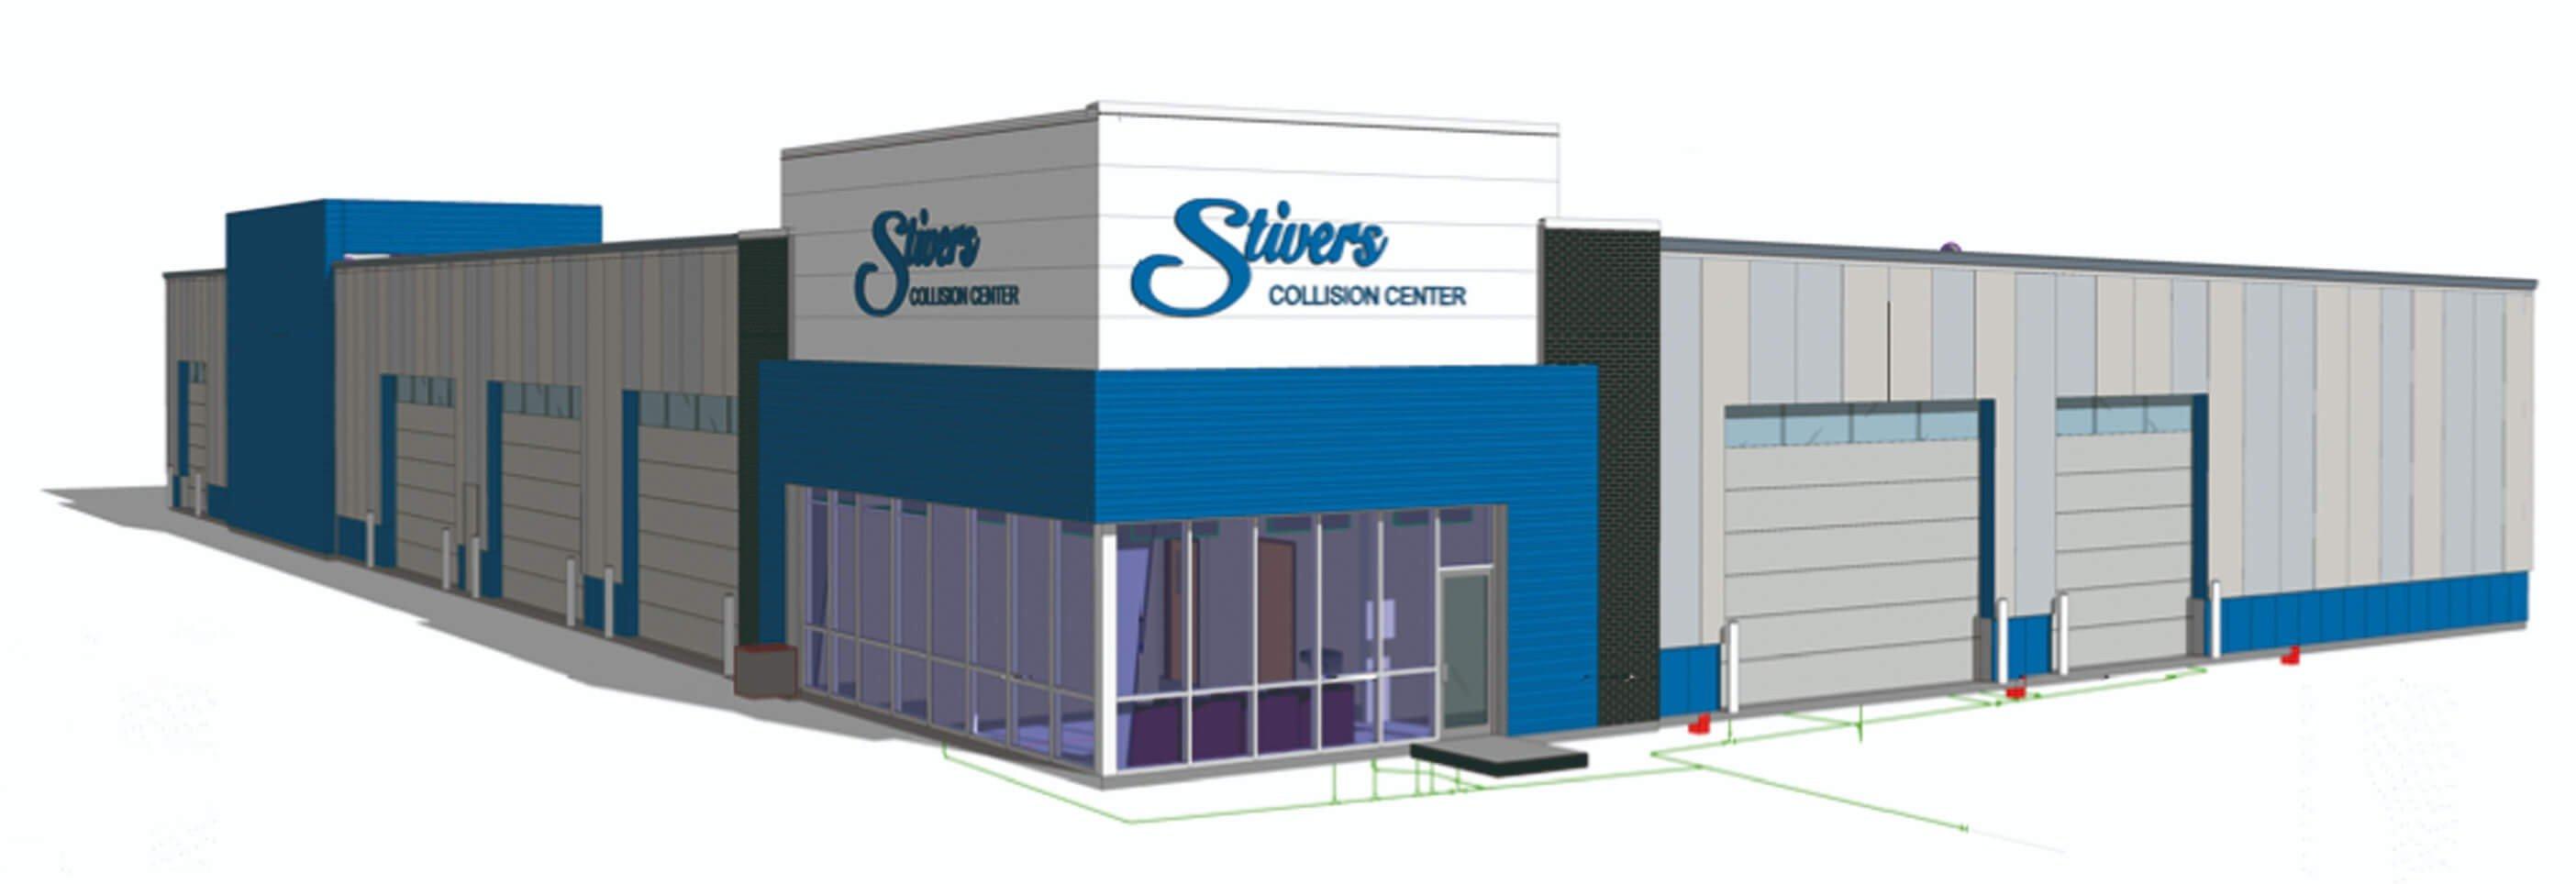 Stivers Collision Center